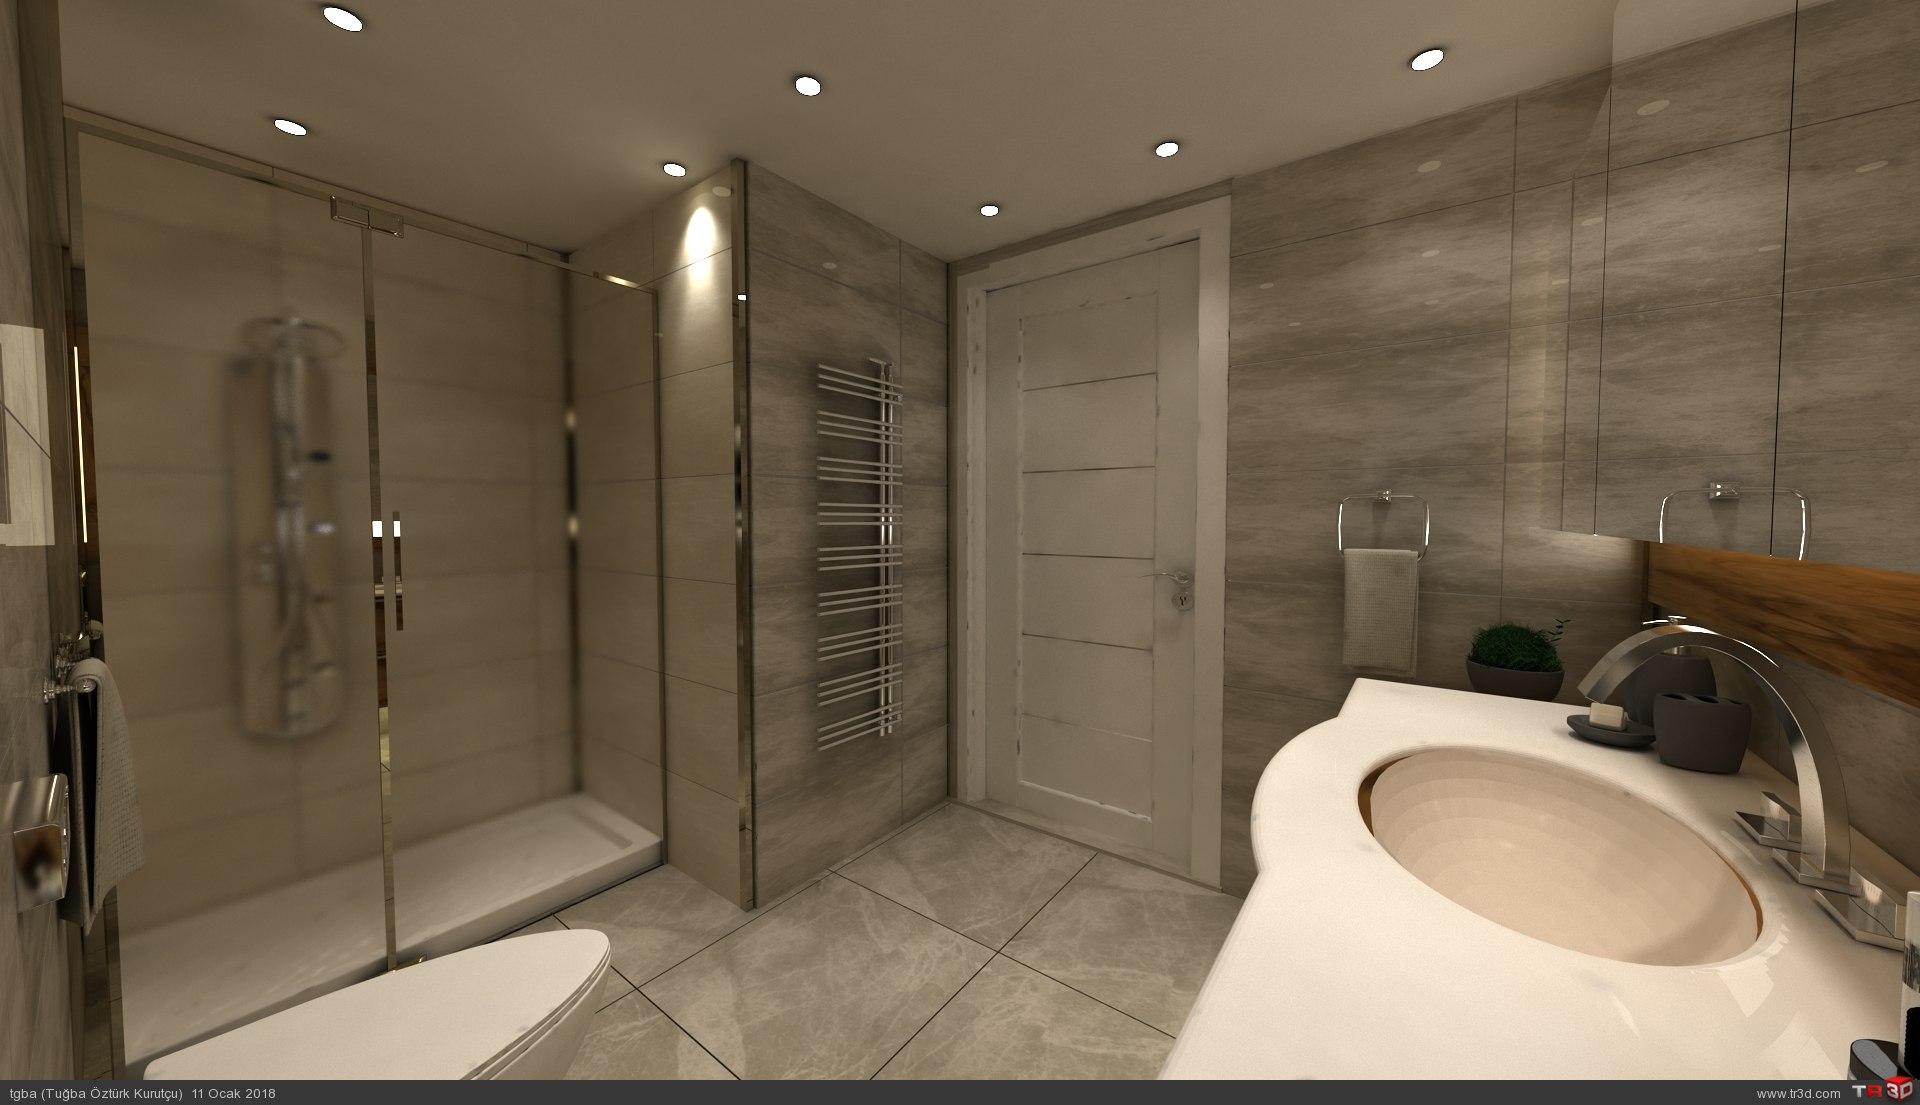 Banyo/bathroom Sade 4